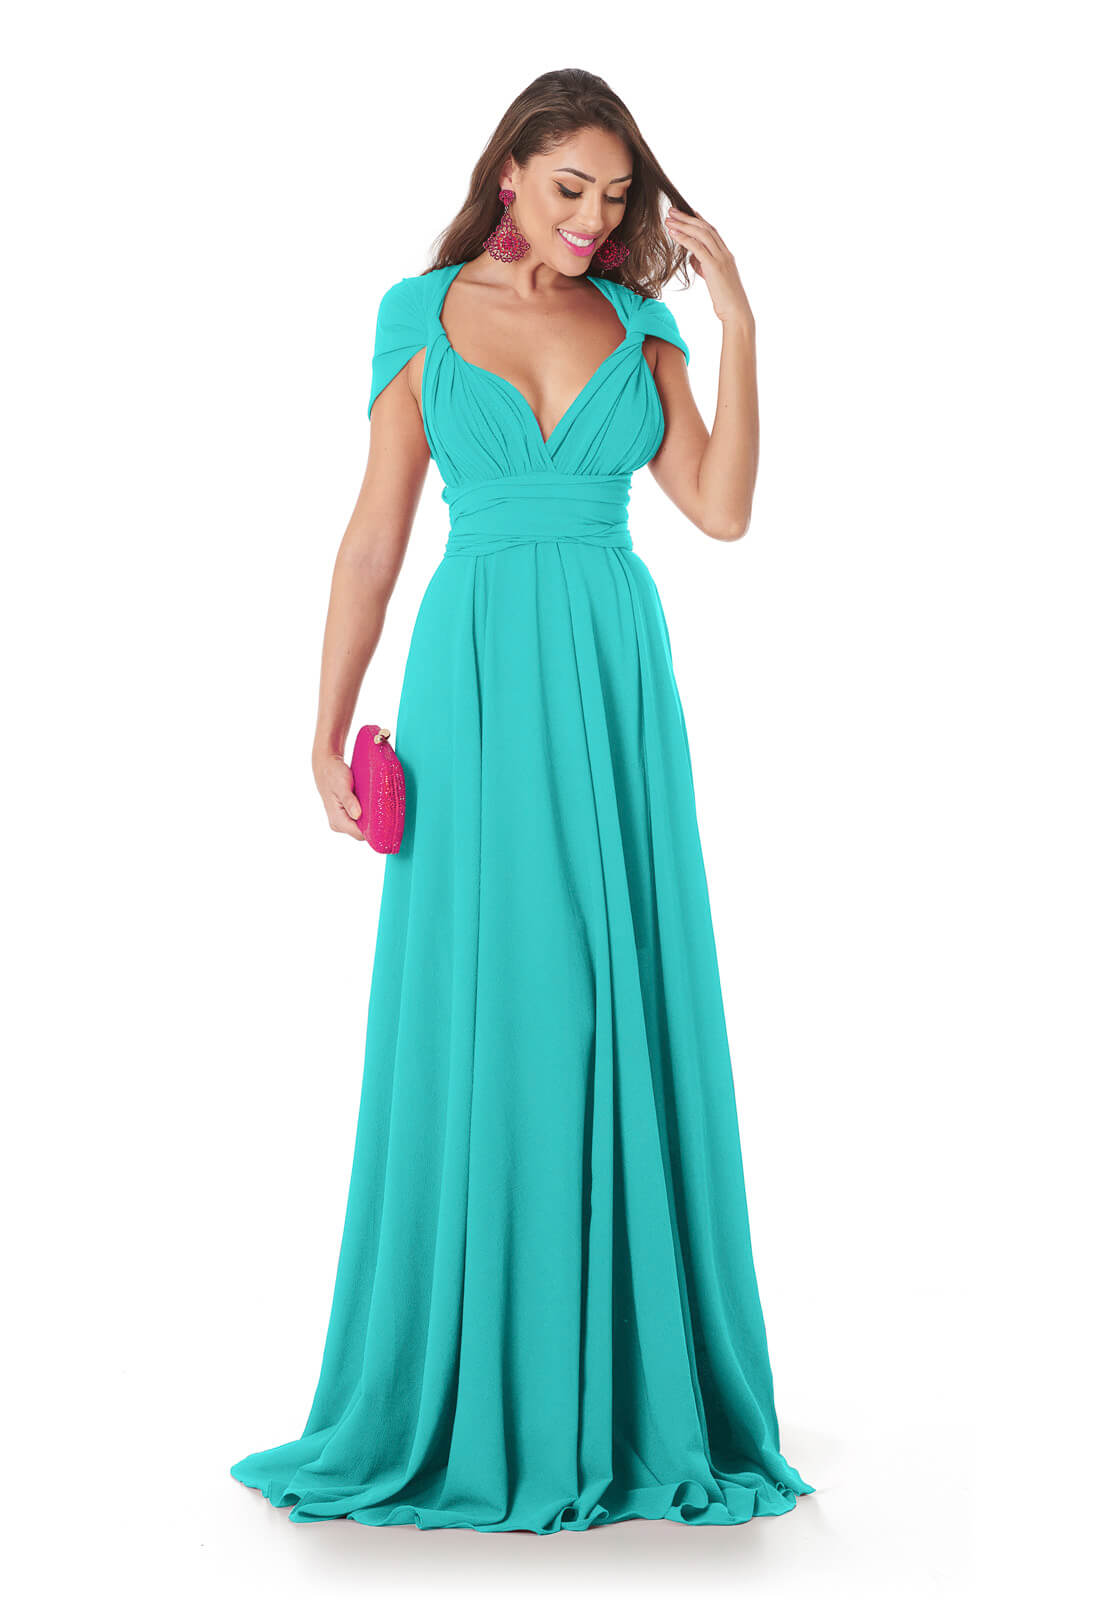 Vestido Mil Formas Azul Tiffany